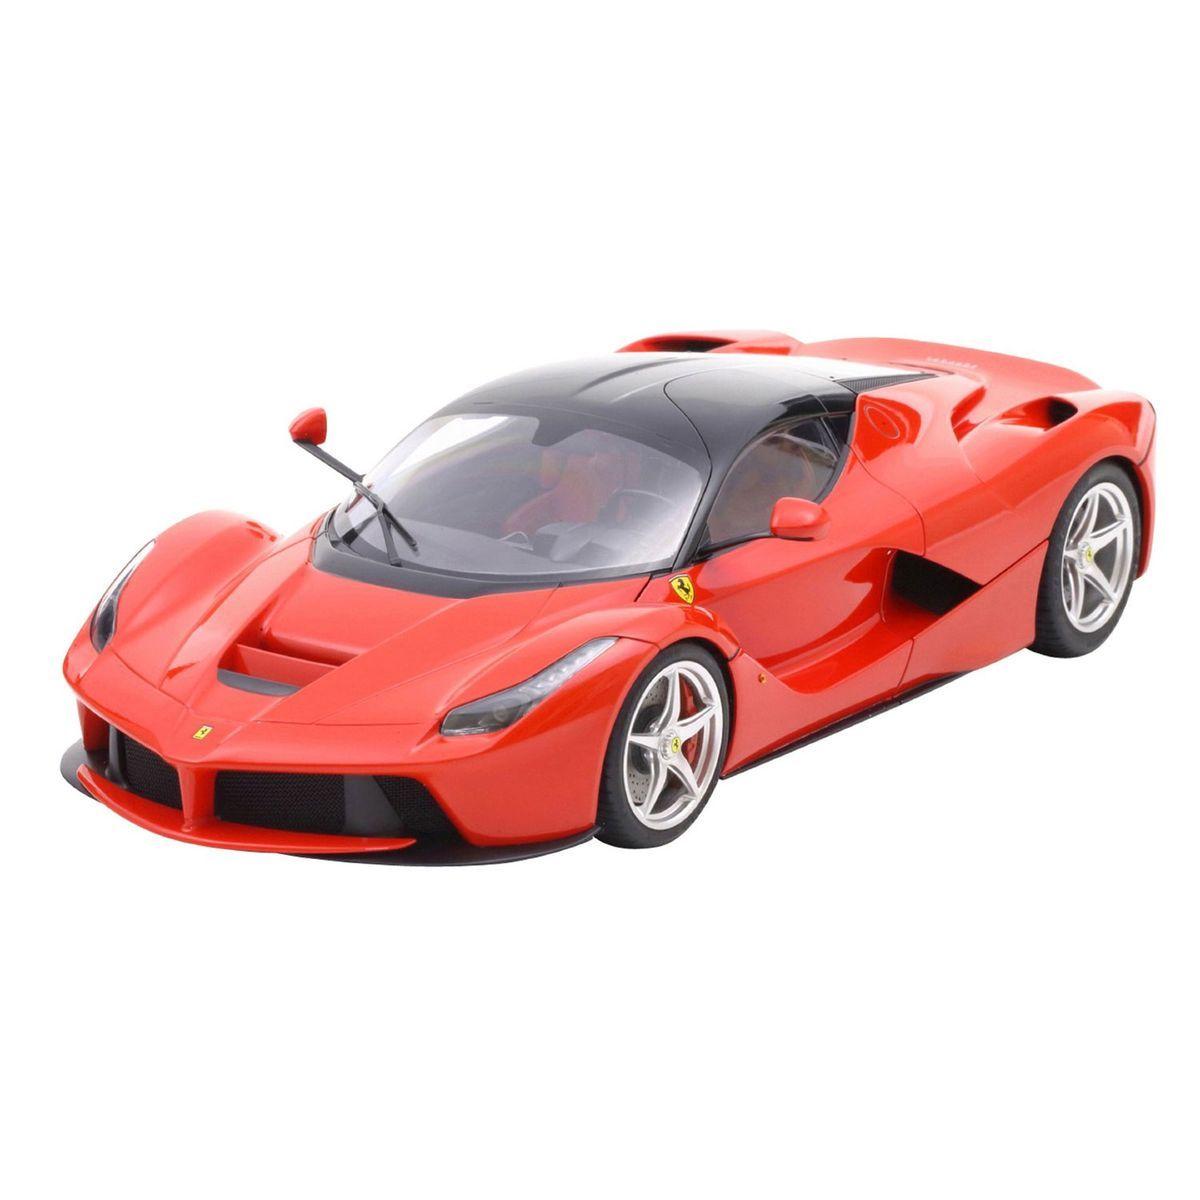 Maquette Voiture La Ferrari V12 Taille Taille Unique